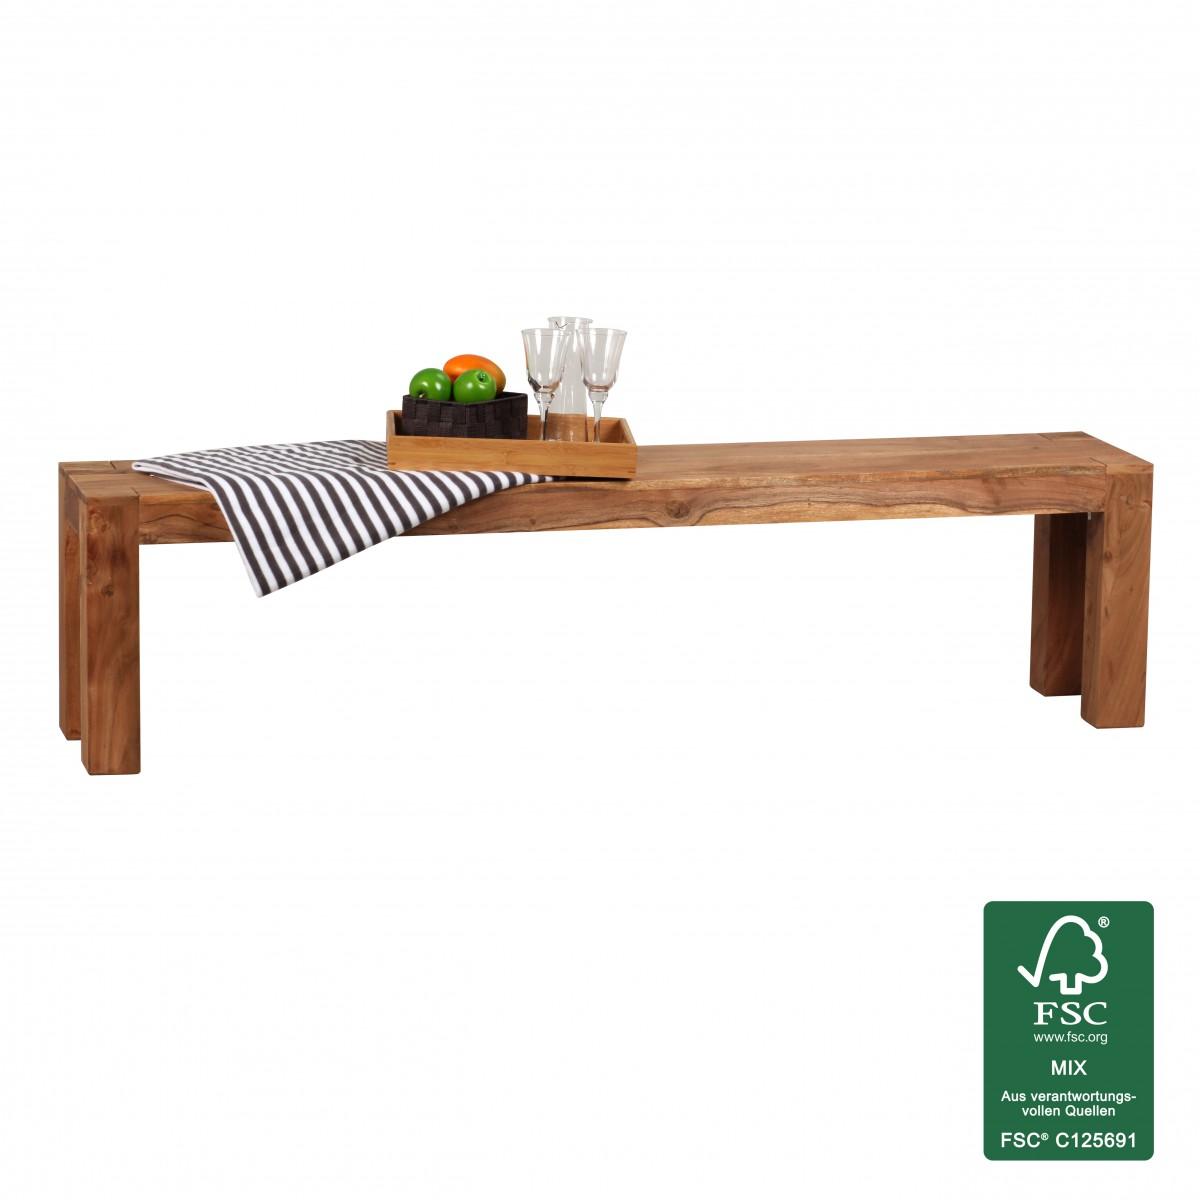 Wohnling acacia de madera maciza banco de comedor 180x35cm for Muebles ebay